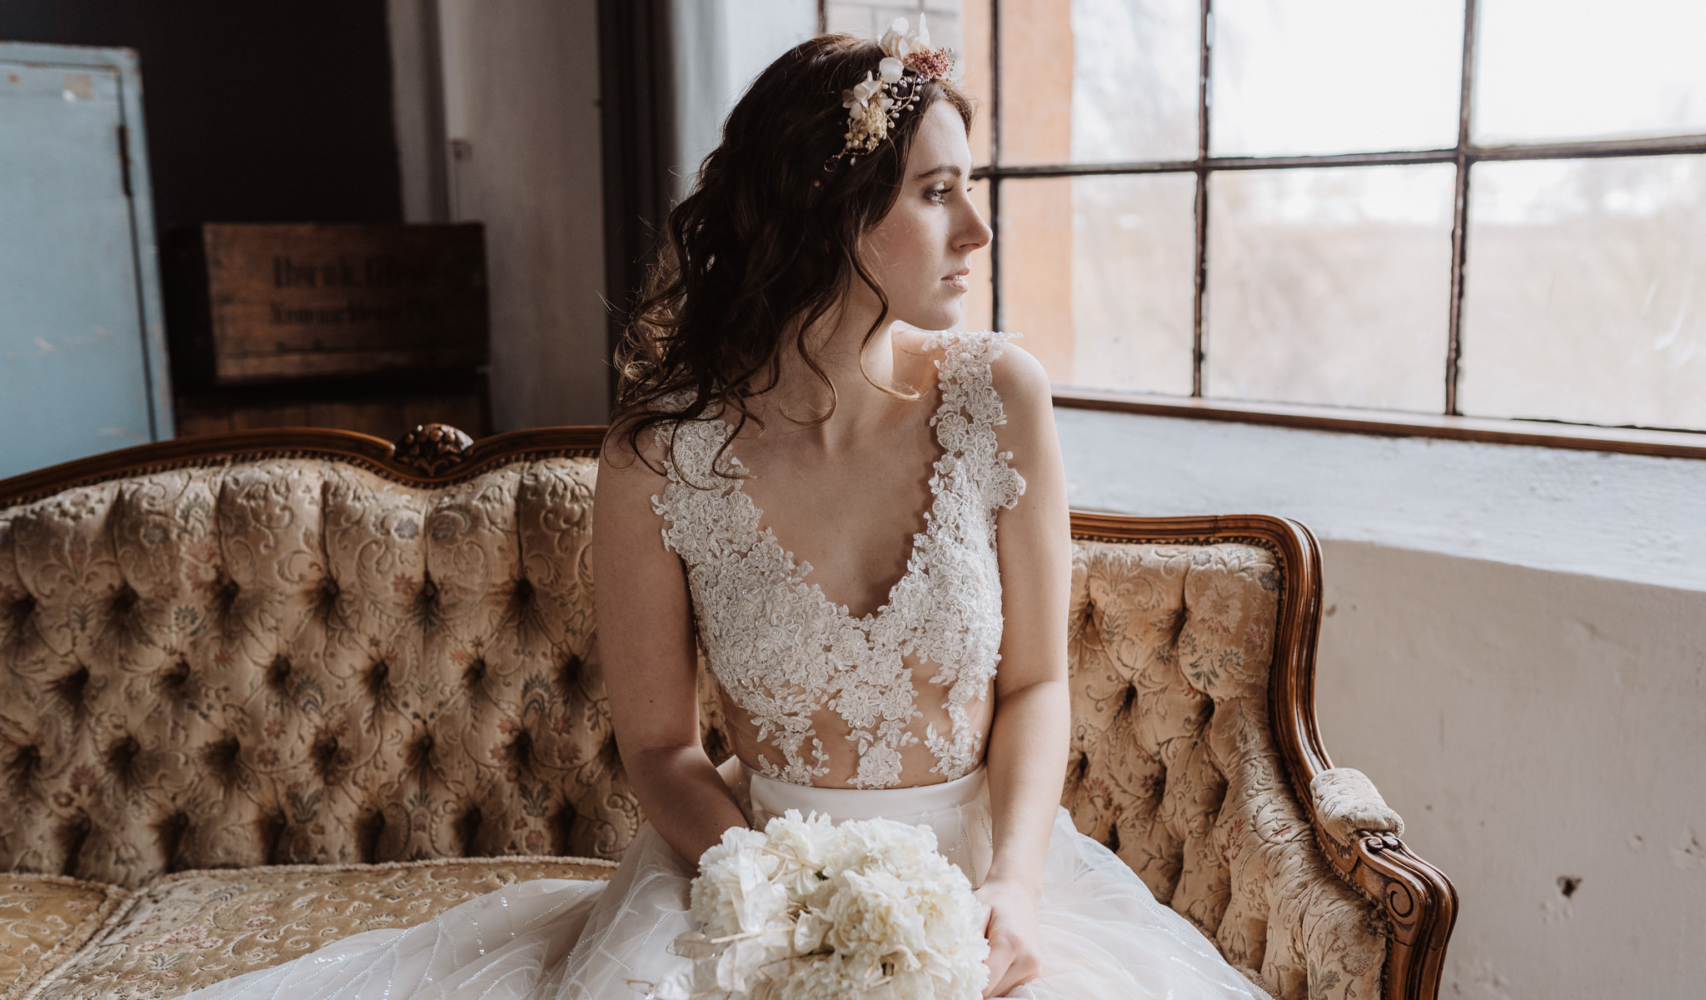 Bridal Editorial_ThuTrinh Photography 2